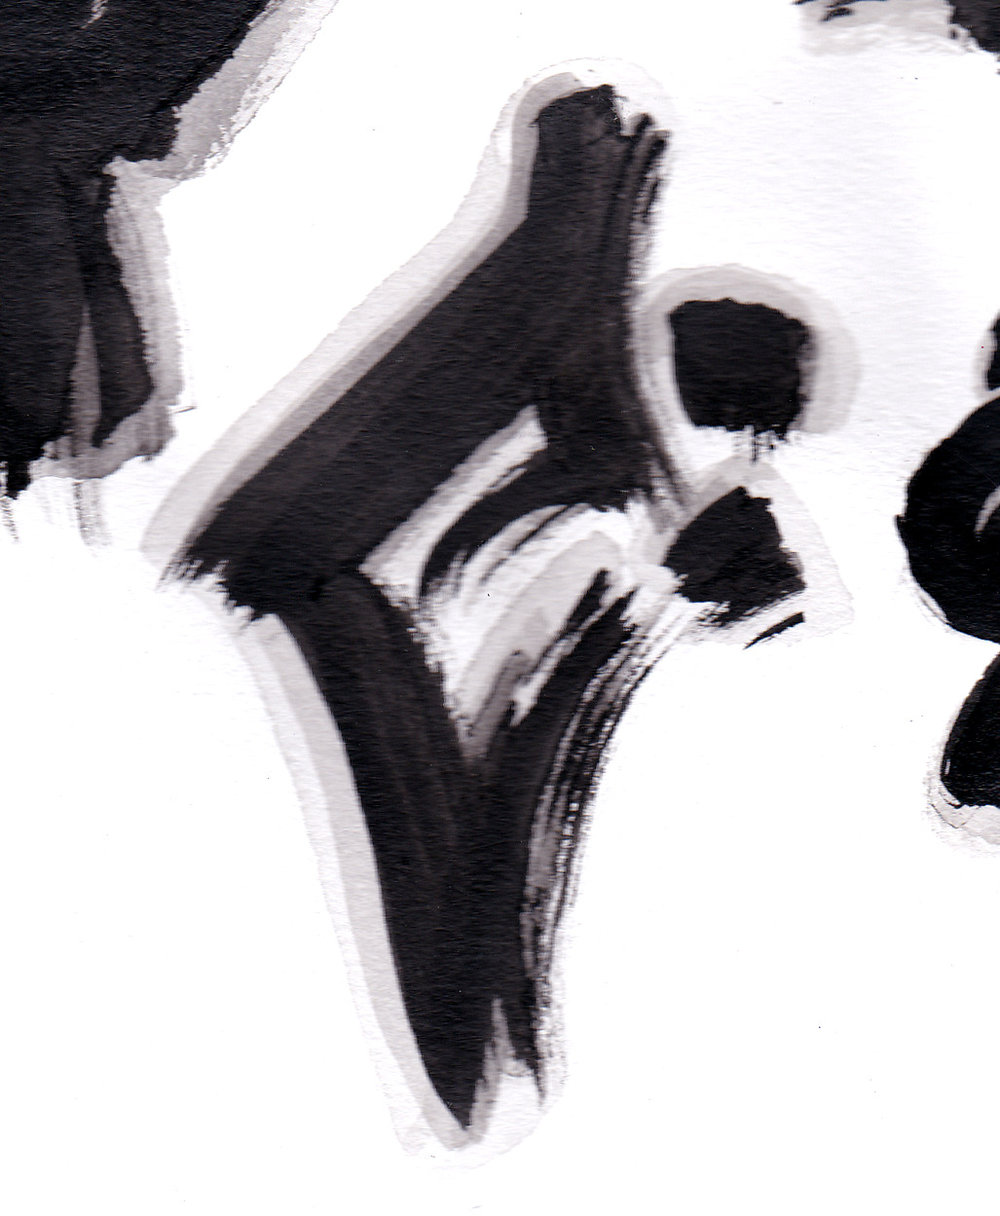 series1_concepttat7.jpg